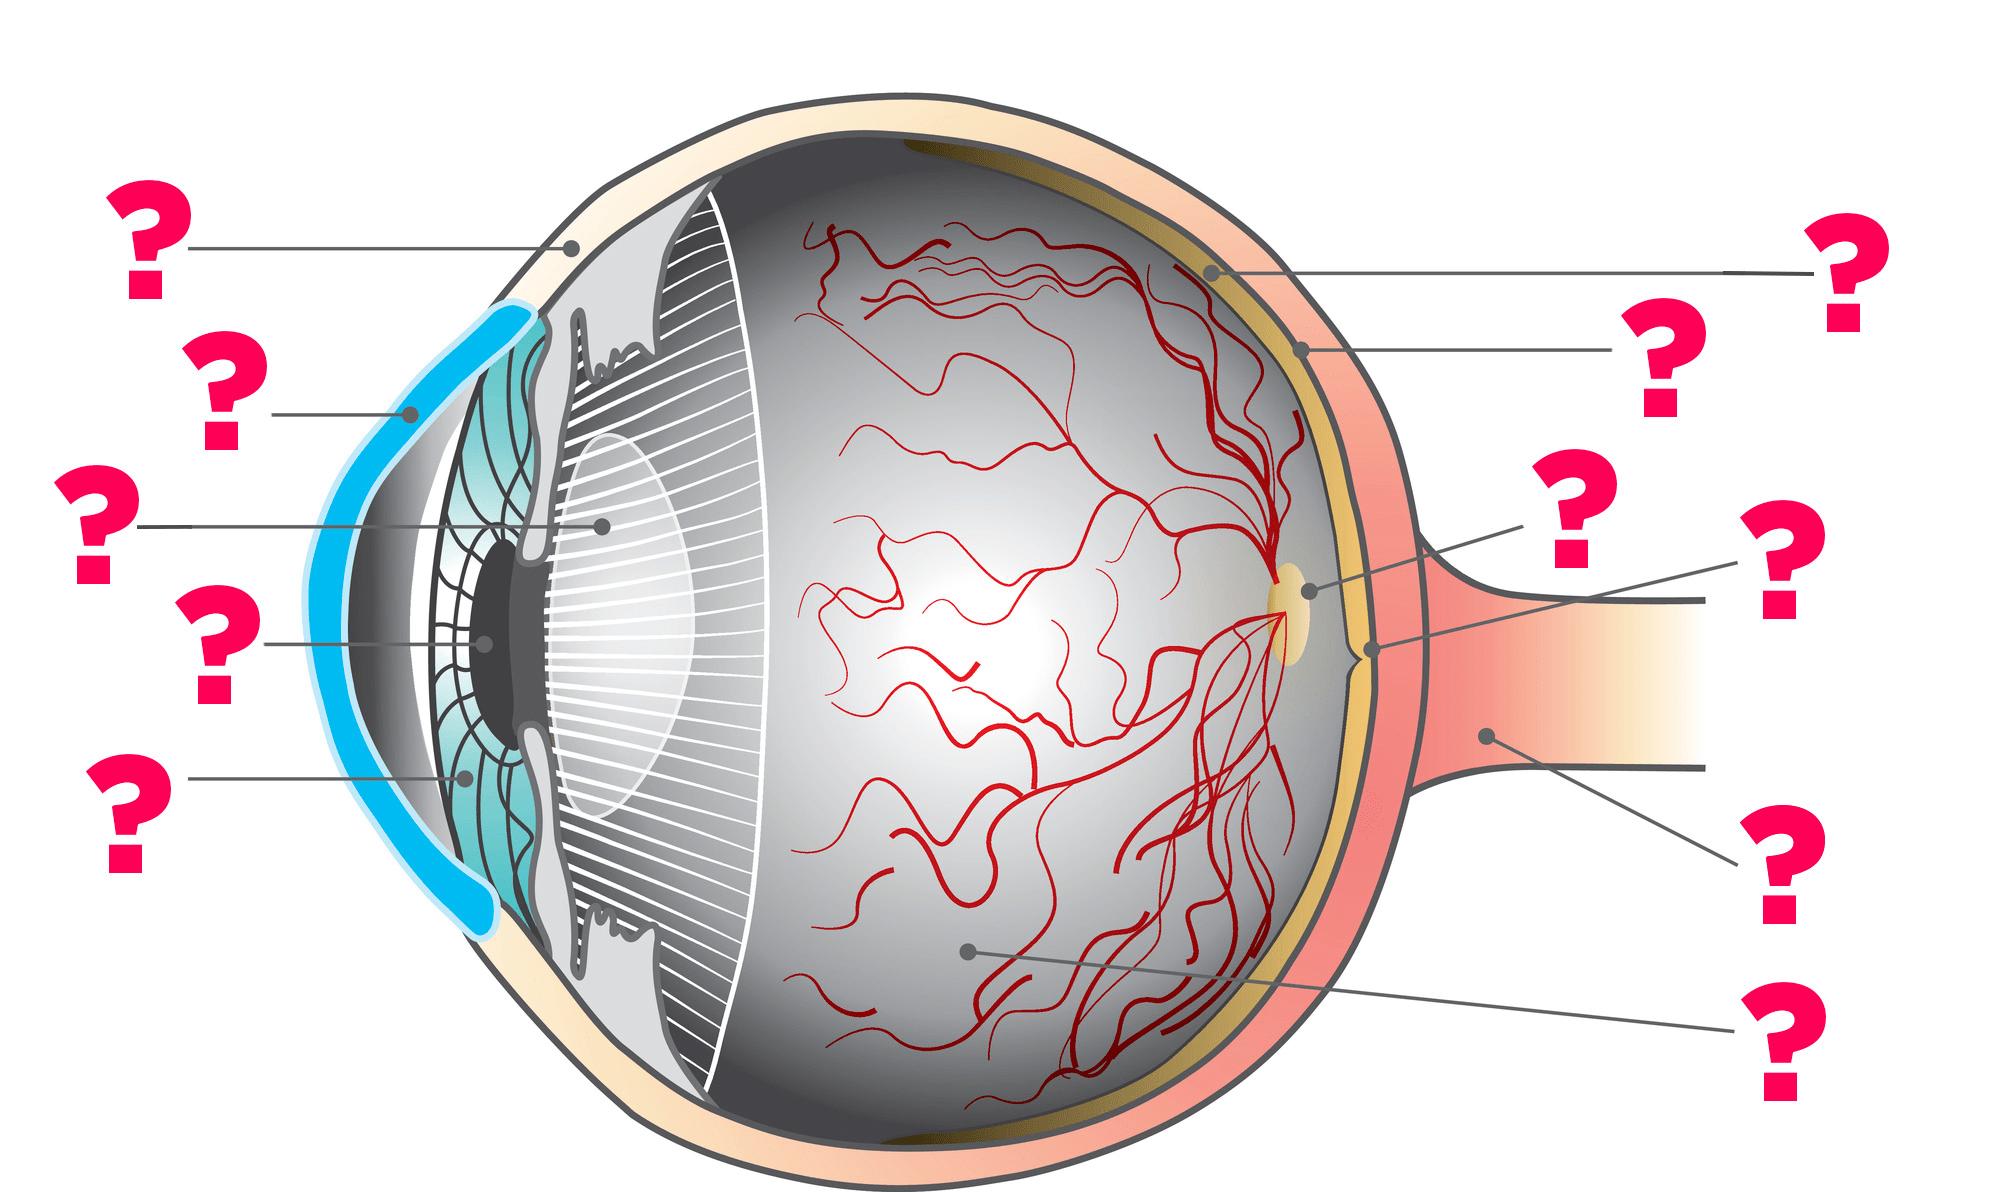 small resolution of eye diagram quiz game ngs wiring diagram cerebral cortex diagram quiz can you get 11 11